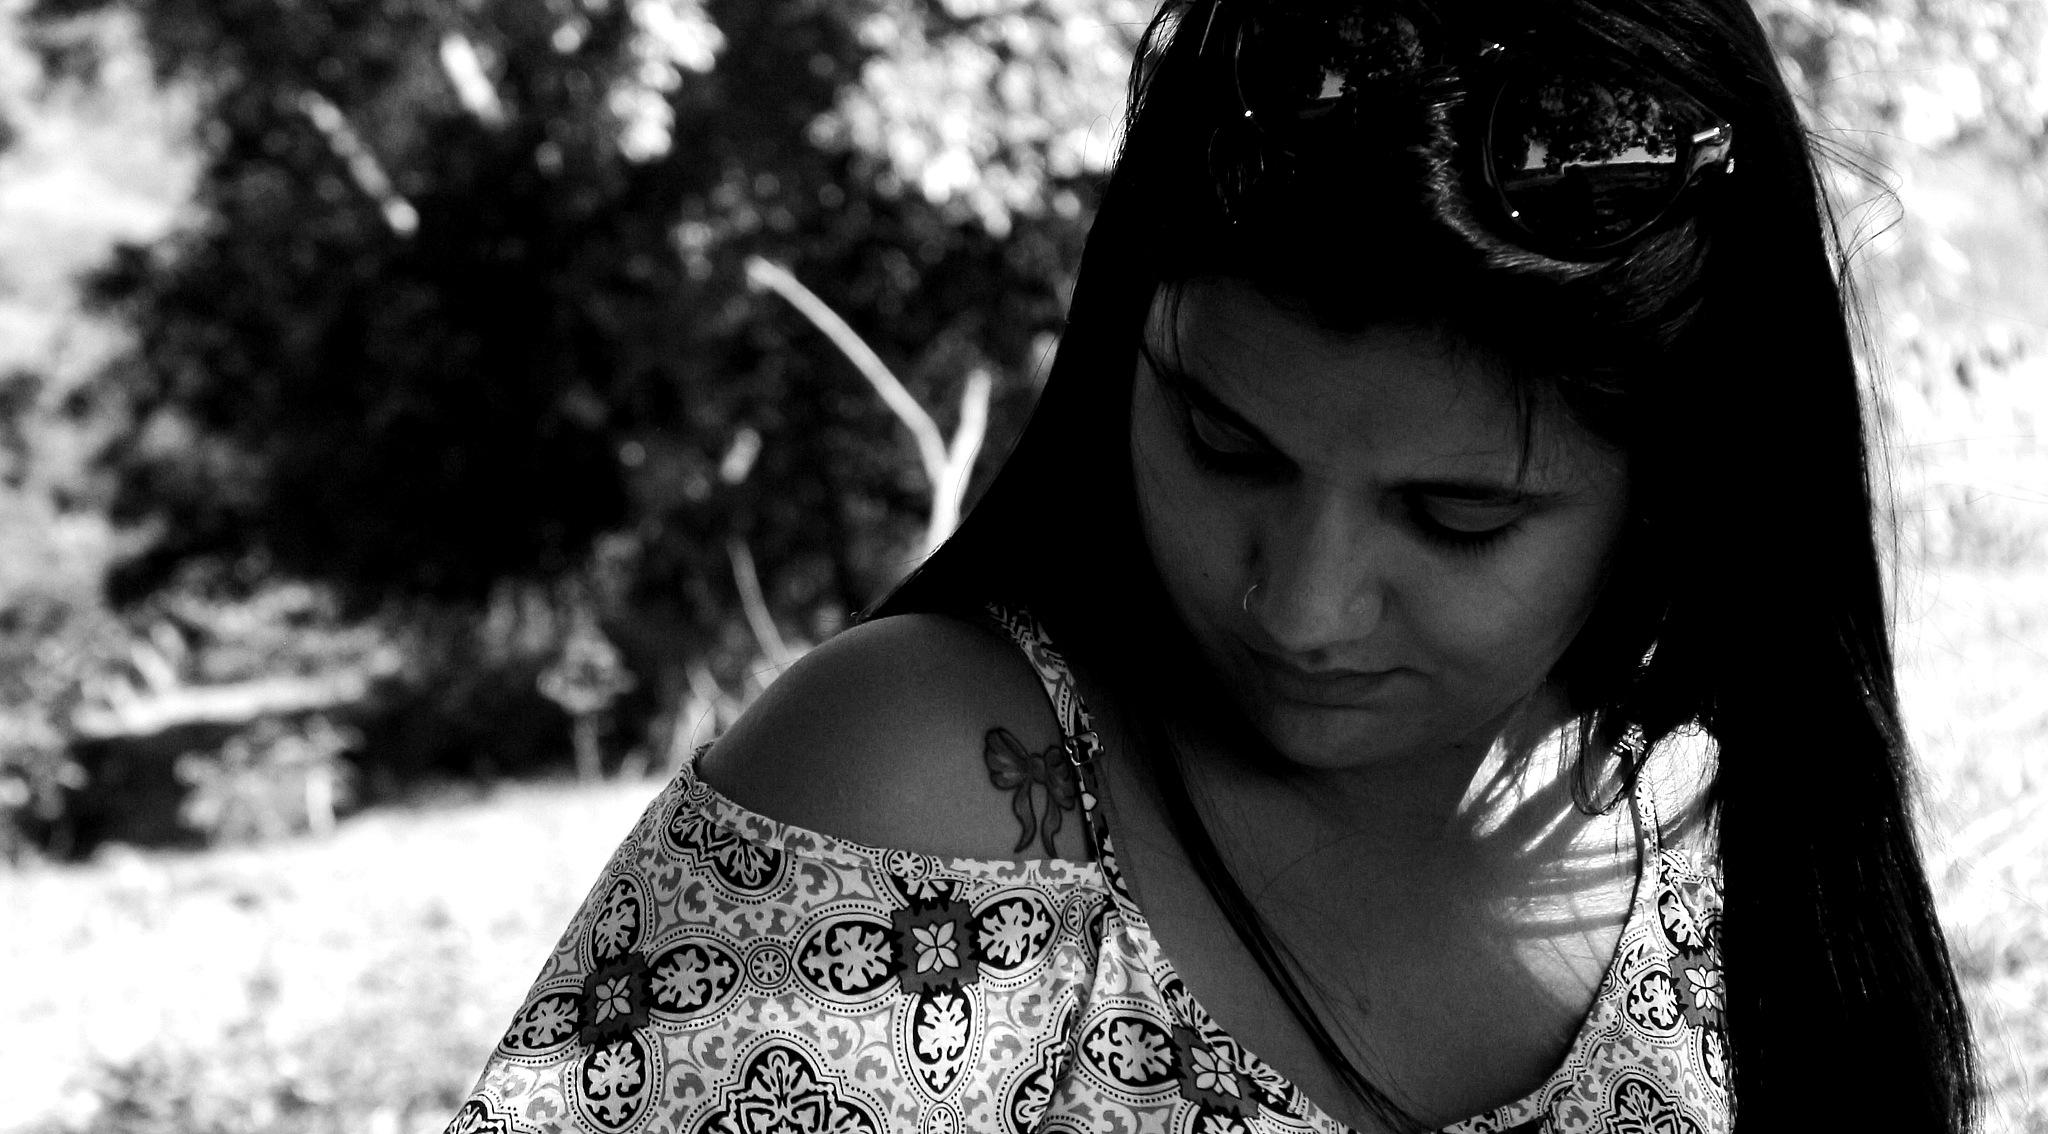 Just Amanda by Marcos Barato